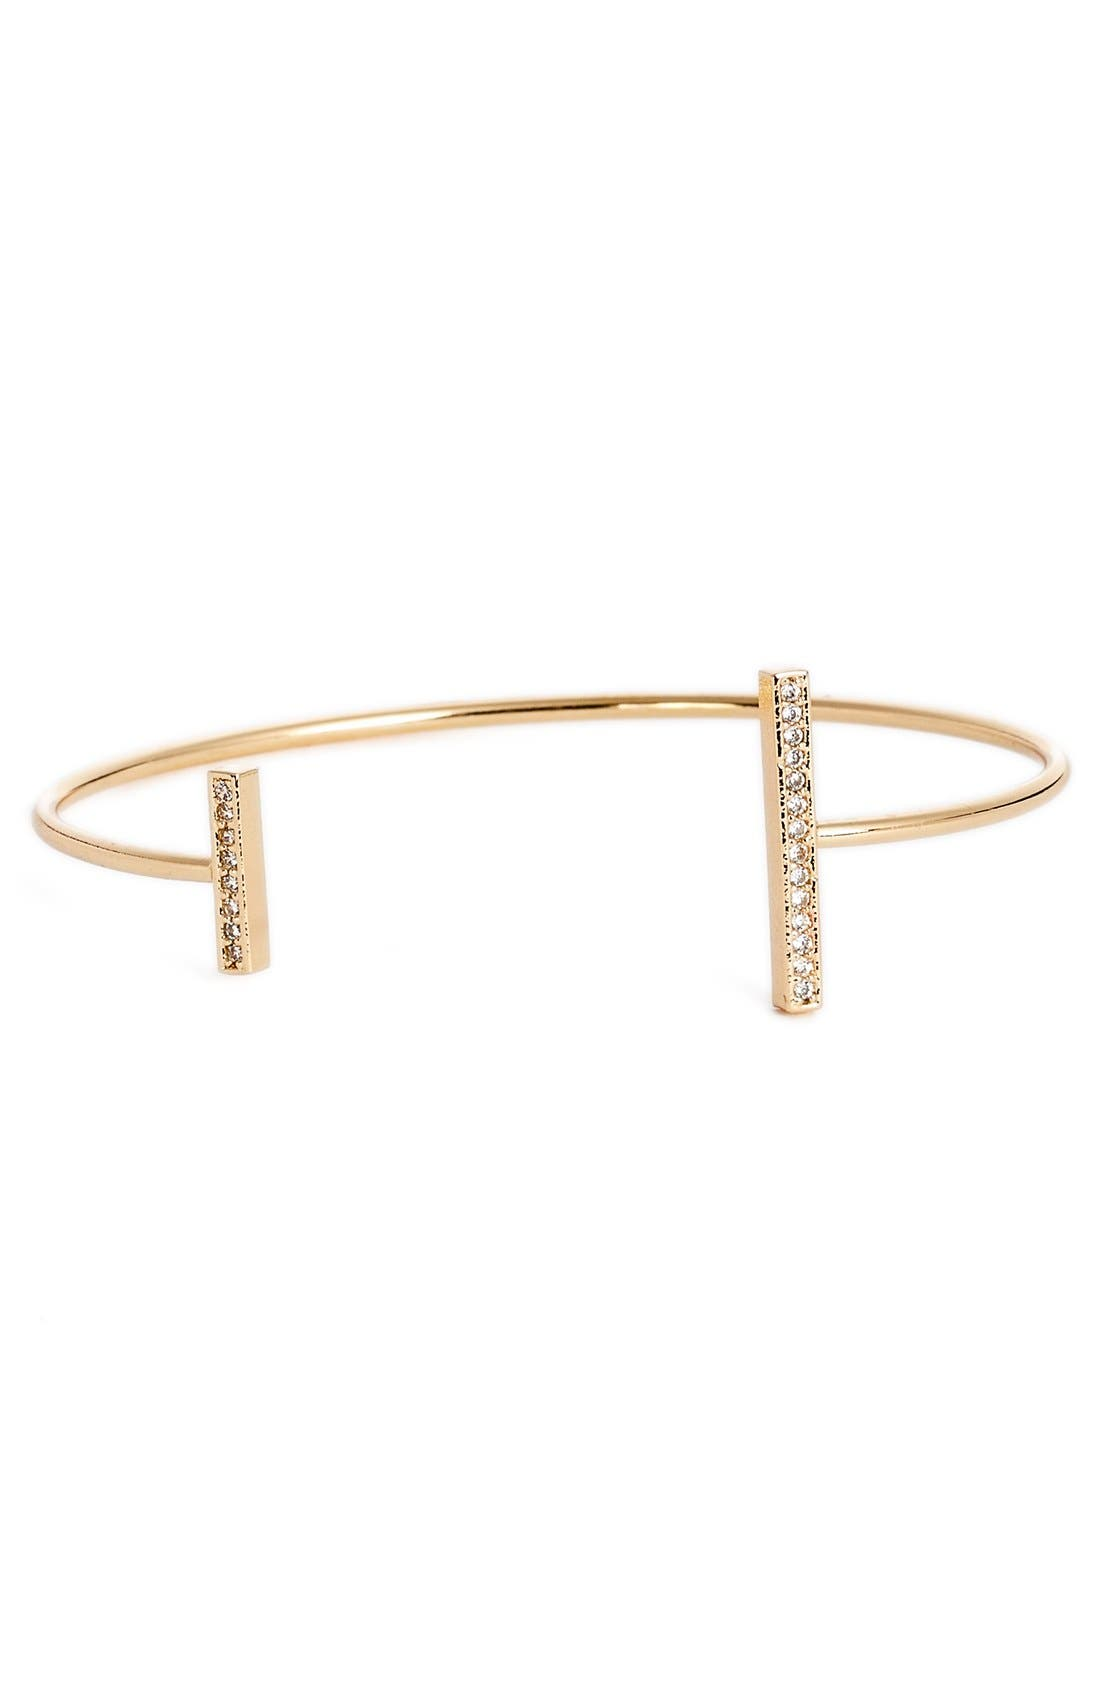 Stone Bar Cuff Bracelet,                         Main,                         color, Gold